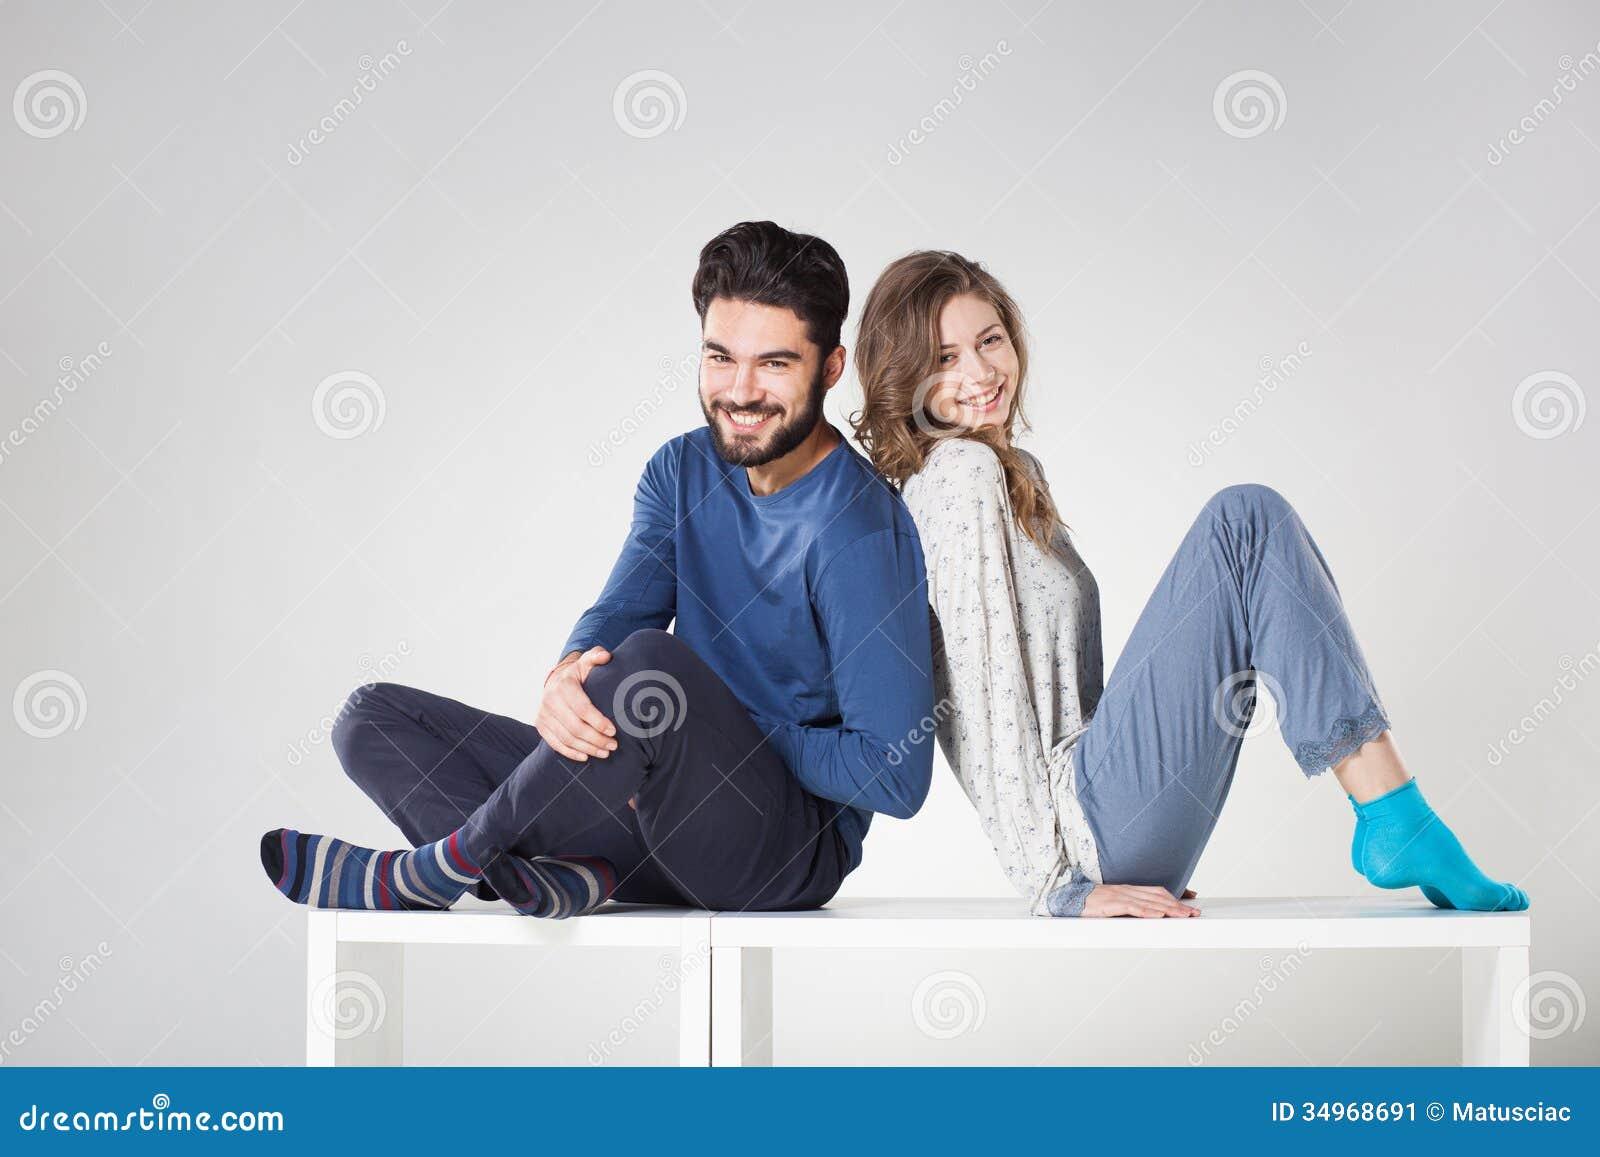 Happy Couple In Pyjama Posing In The Studio Stock Image